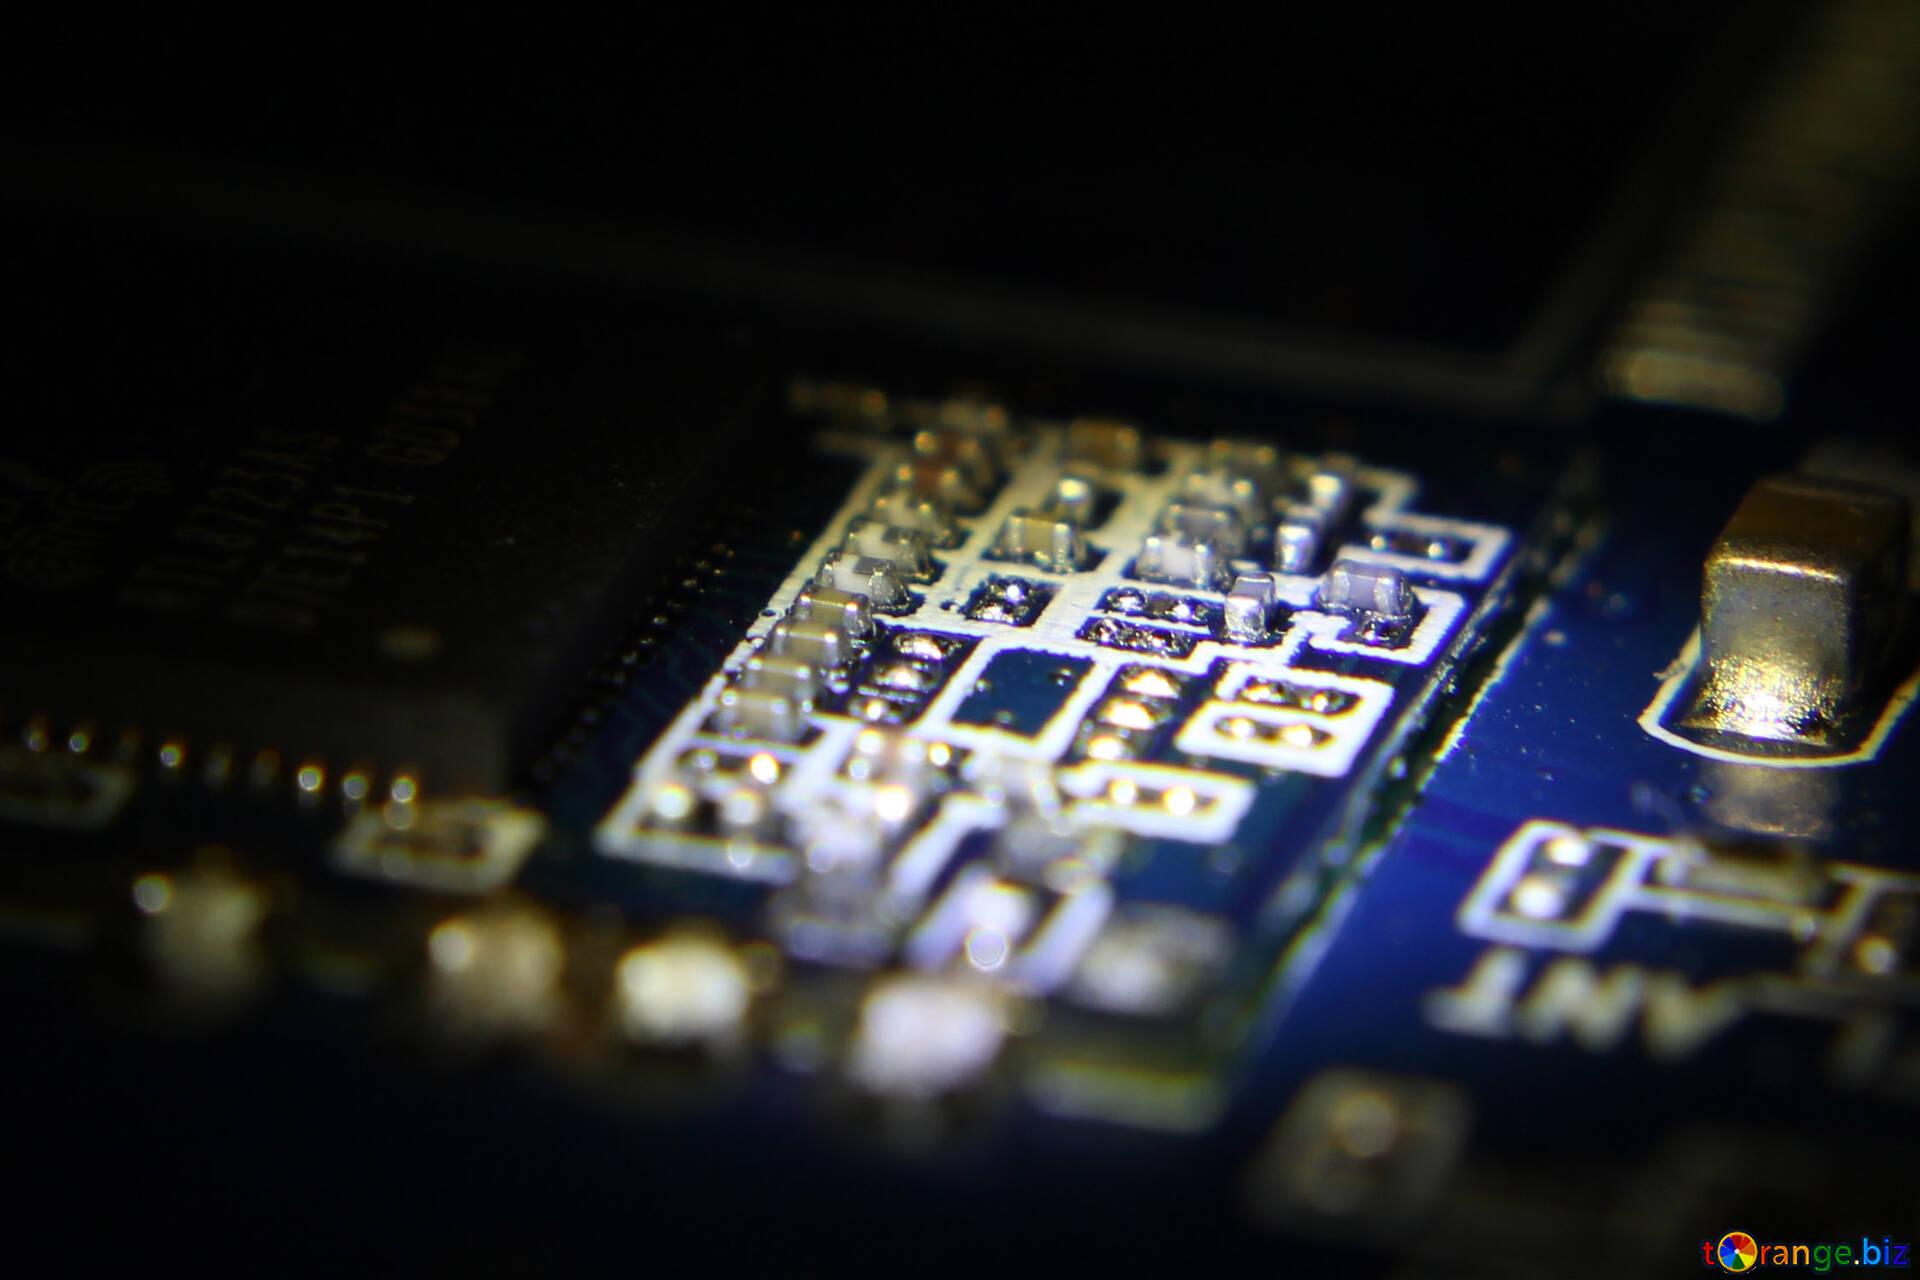 Mobile communications elektrische schaltung komponenten computer № 40839